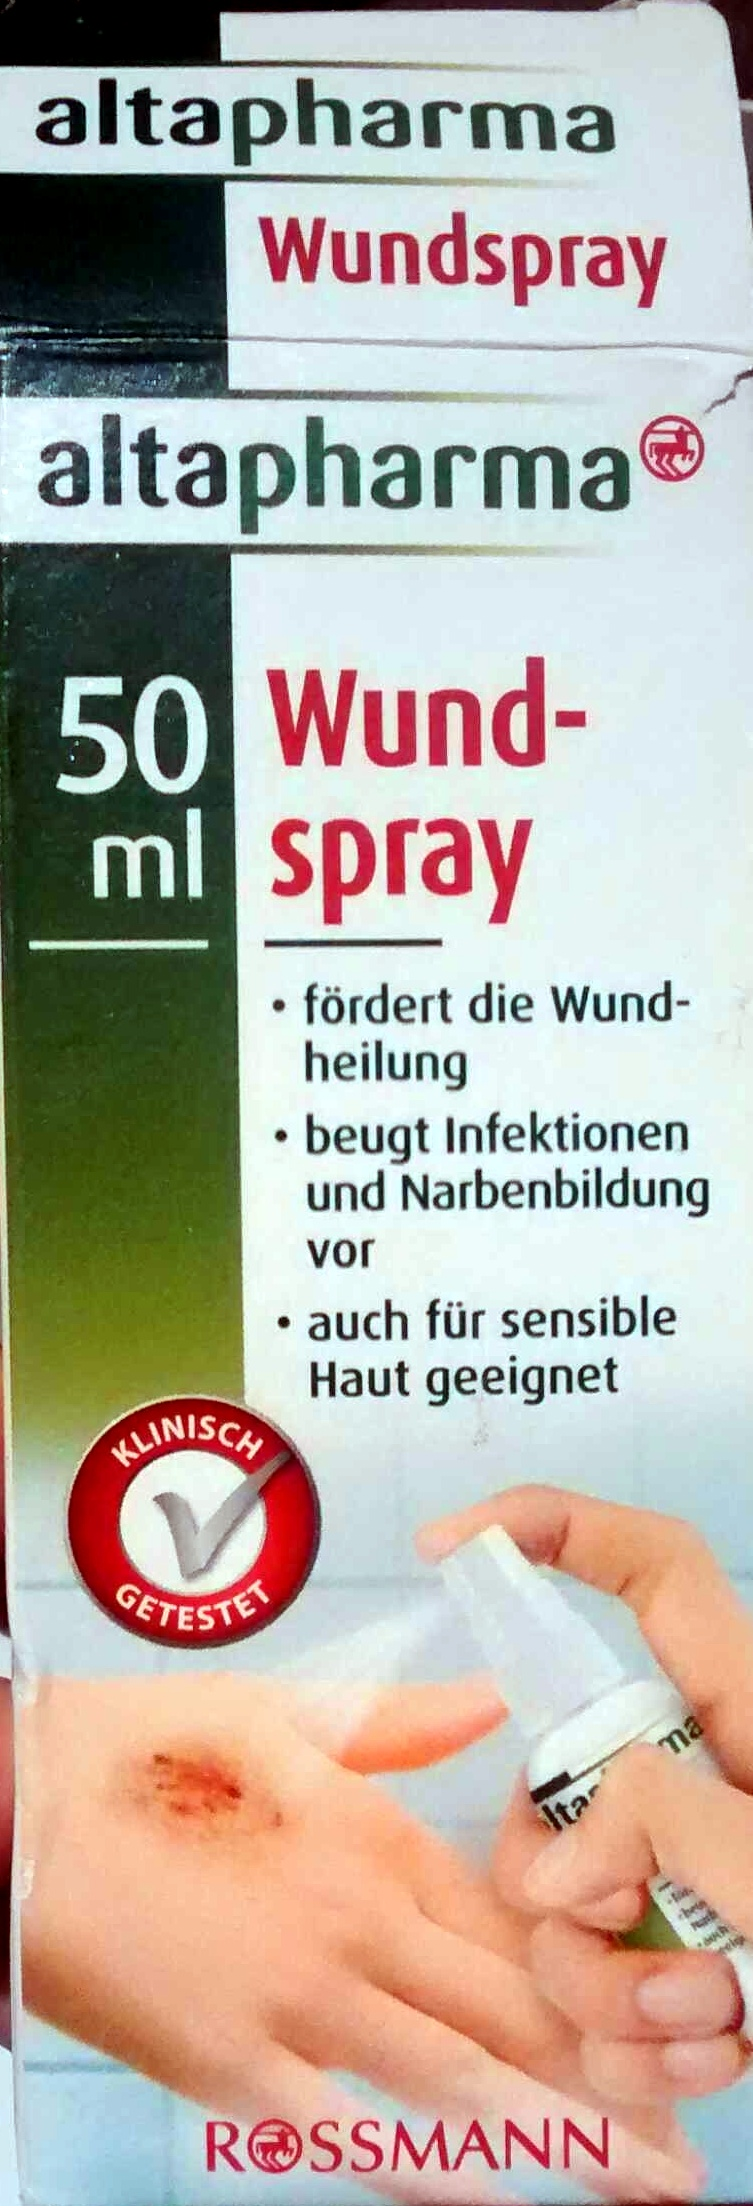 Wundspray - Product